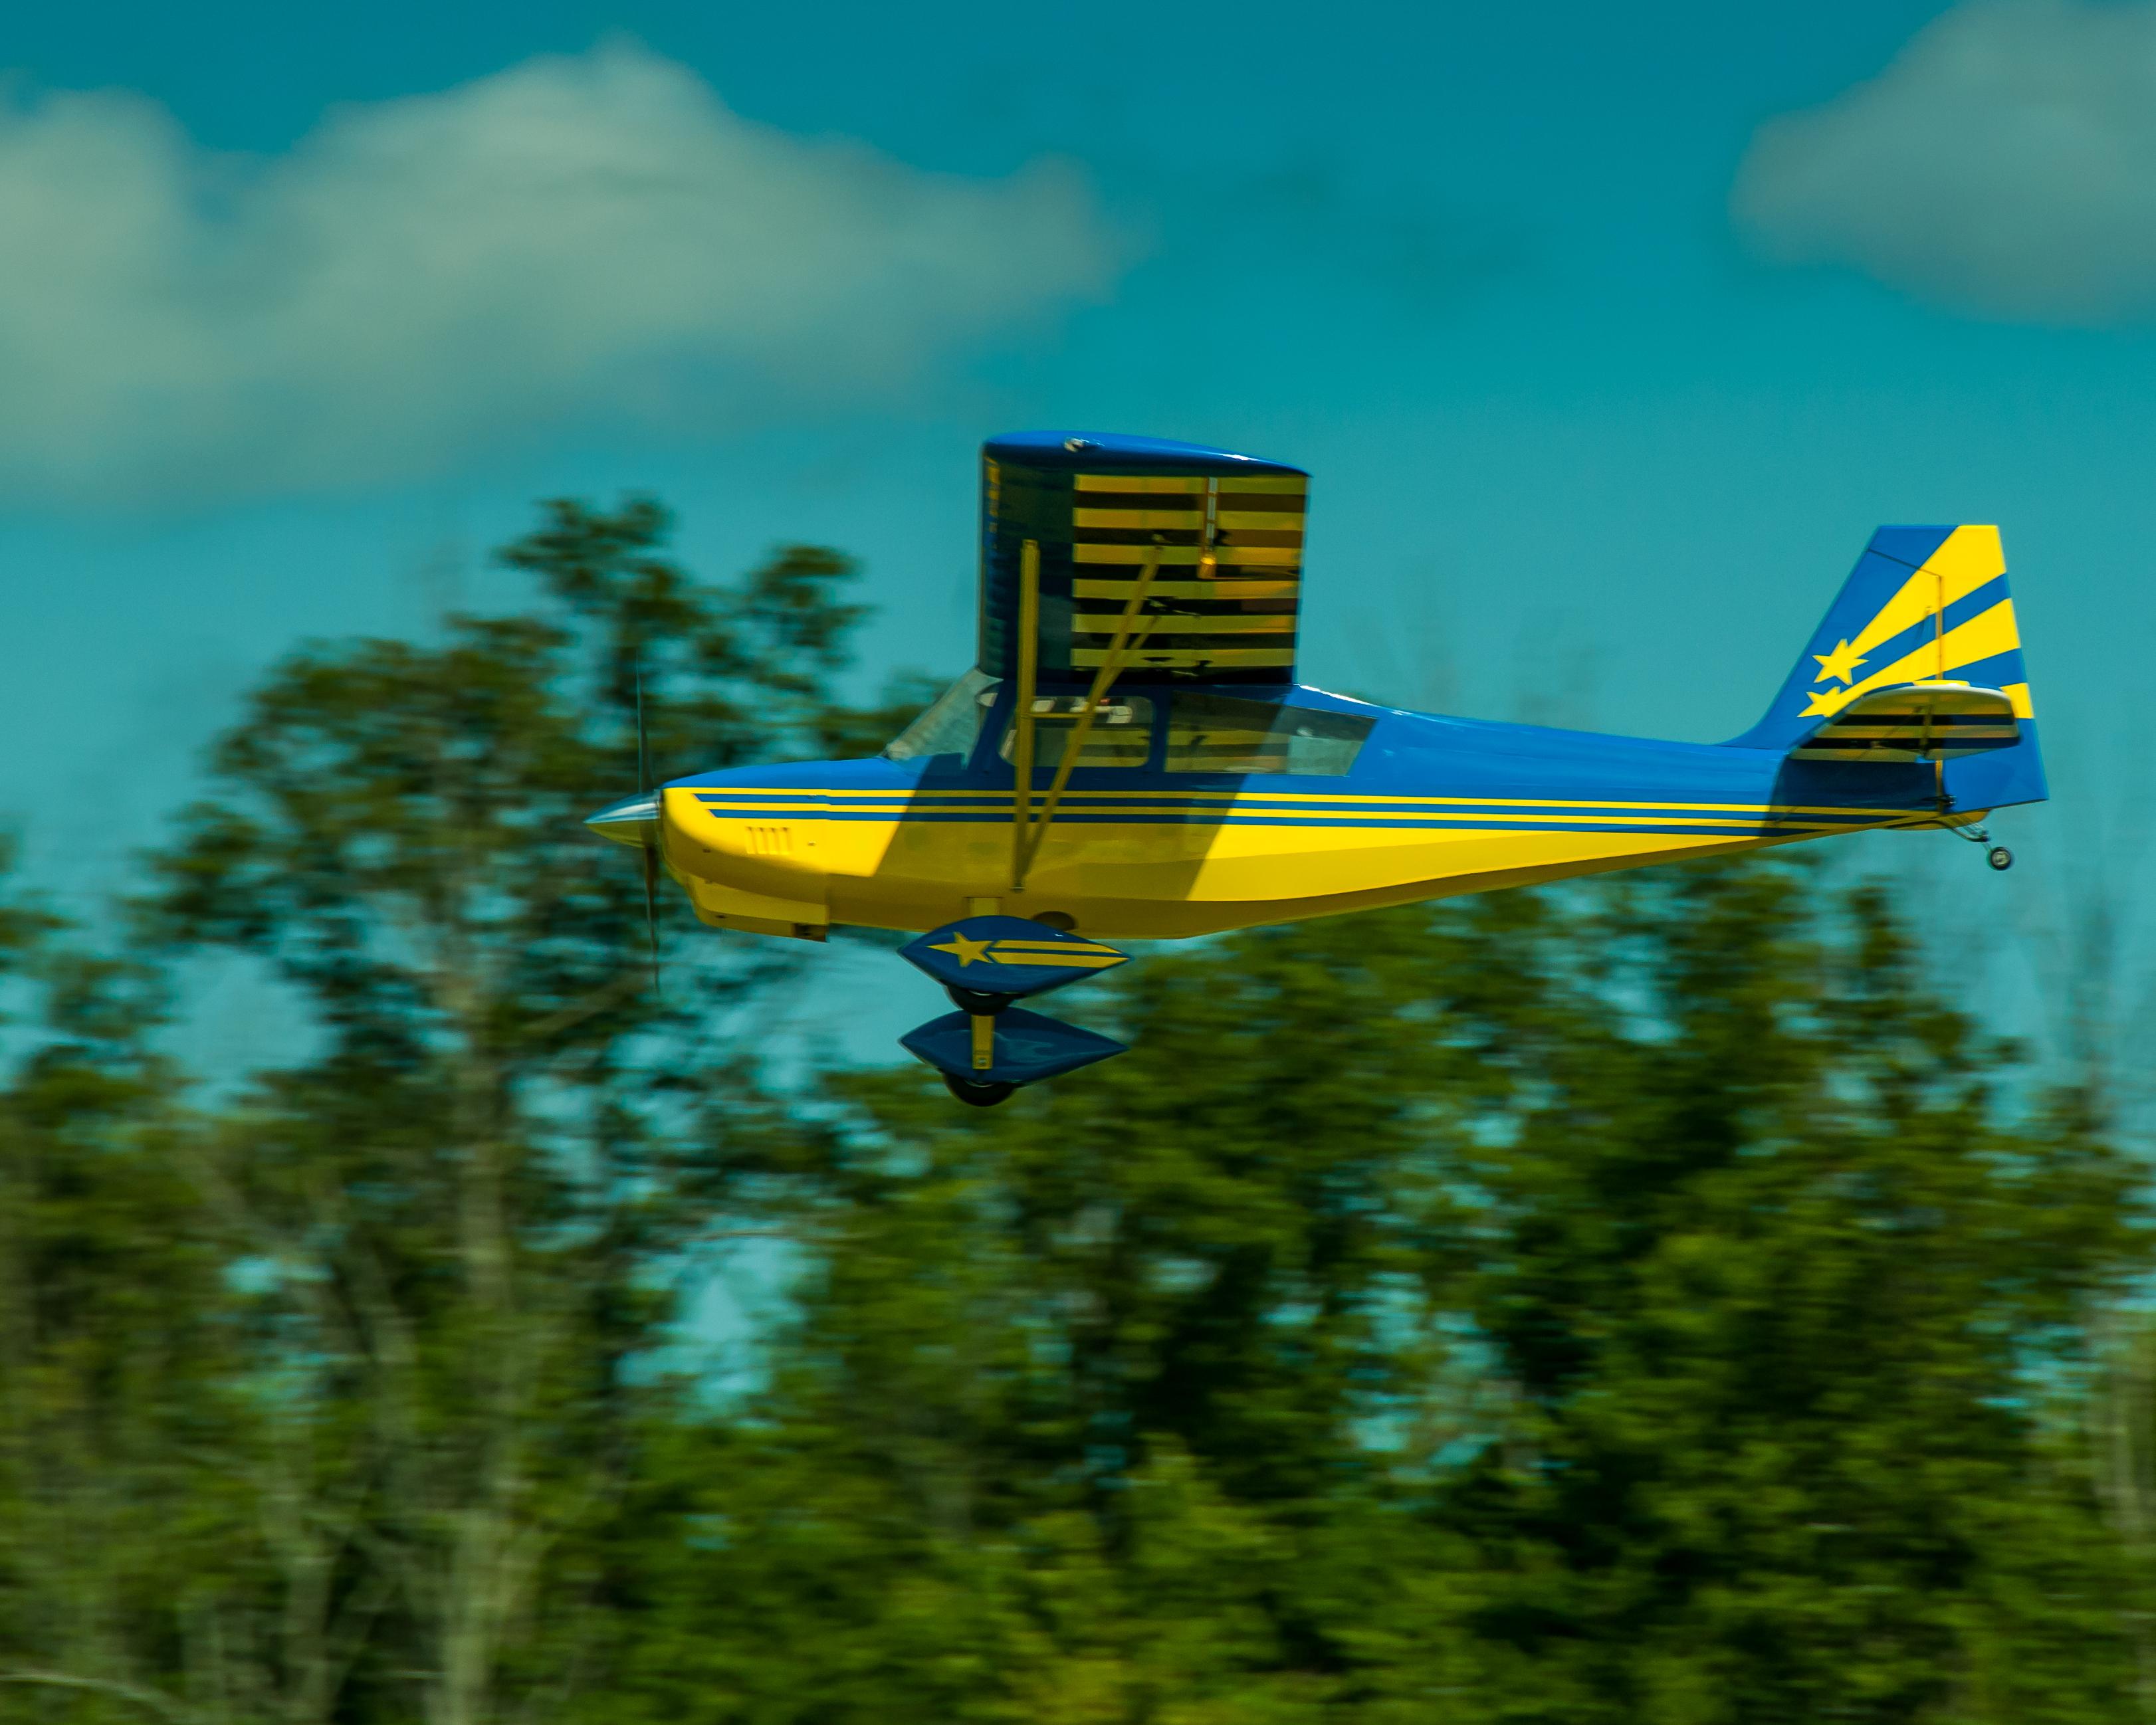 # - 366 - Blue & Yellow Decathlon